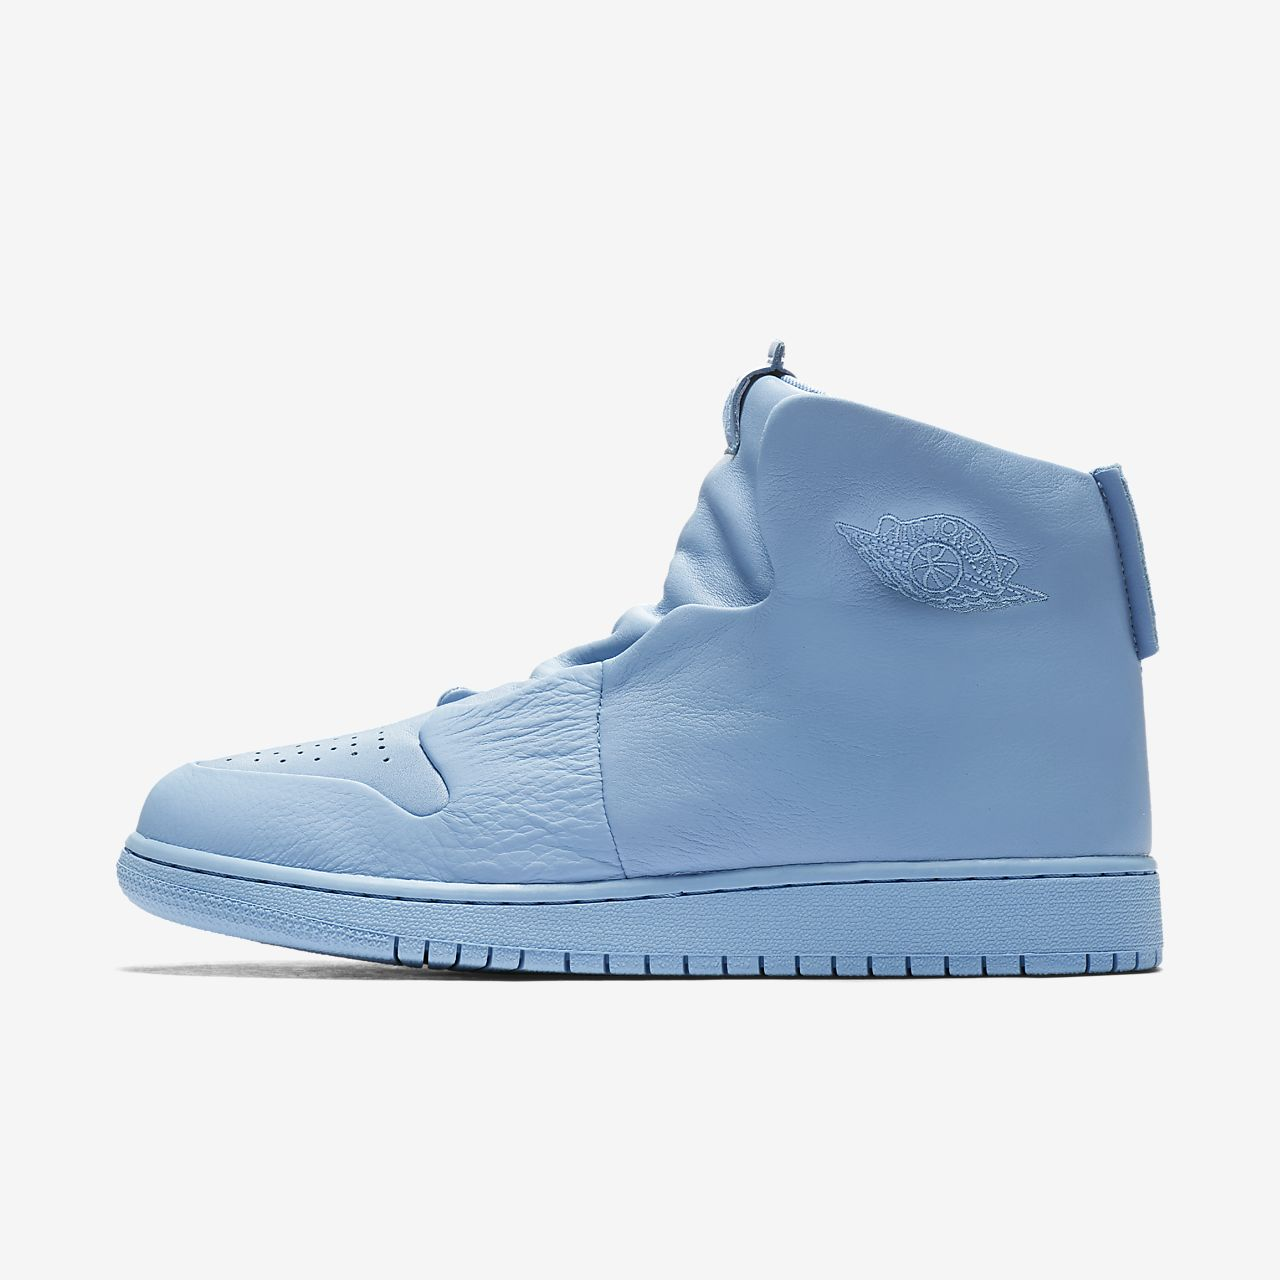 4c62b2fb21b2 Jordan AJ1 Sage XX Women s Shoe. Nike.com GB